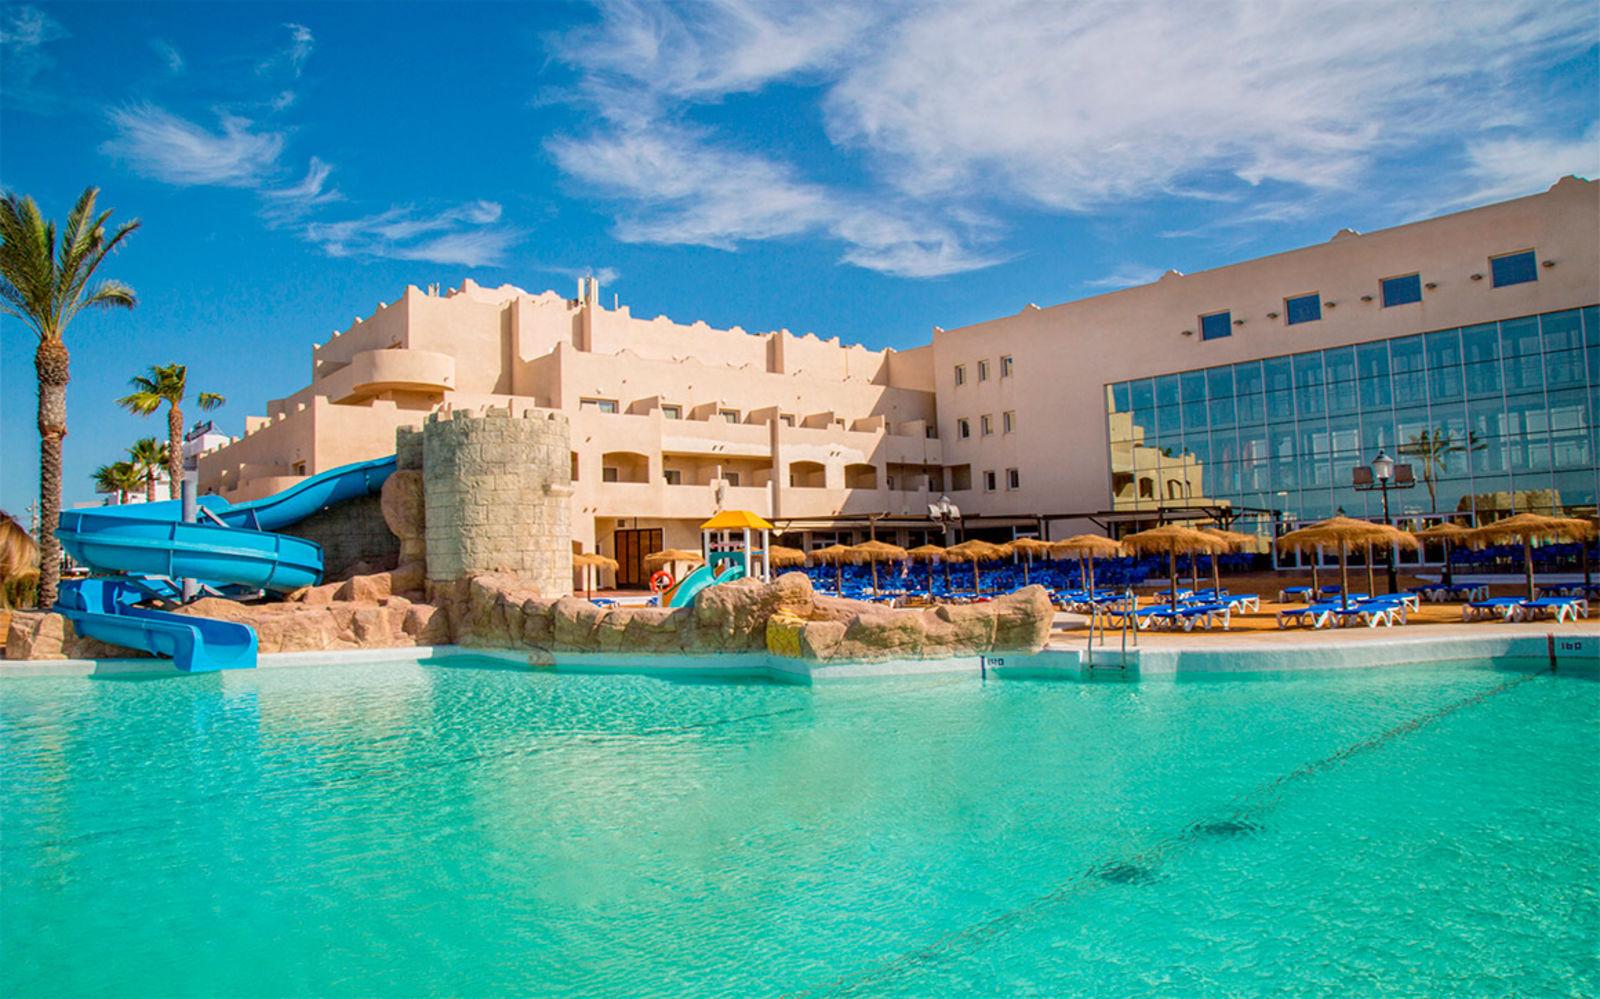 Hotel Cabo de Gata 4* by Senator Hoteles